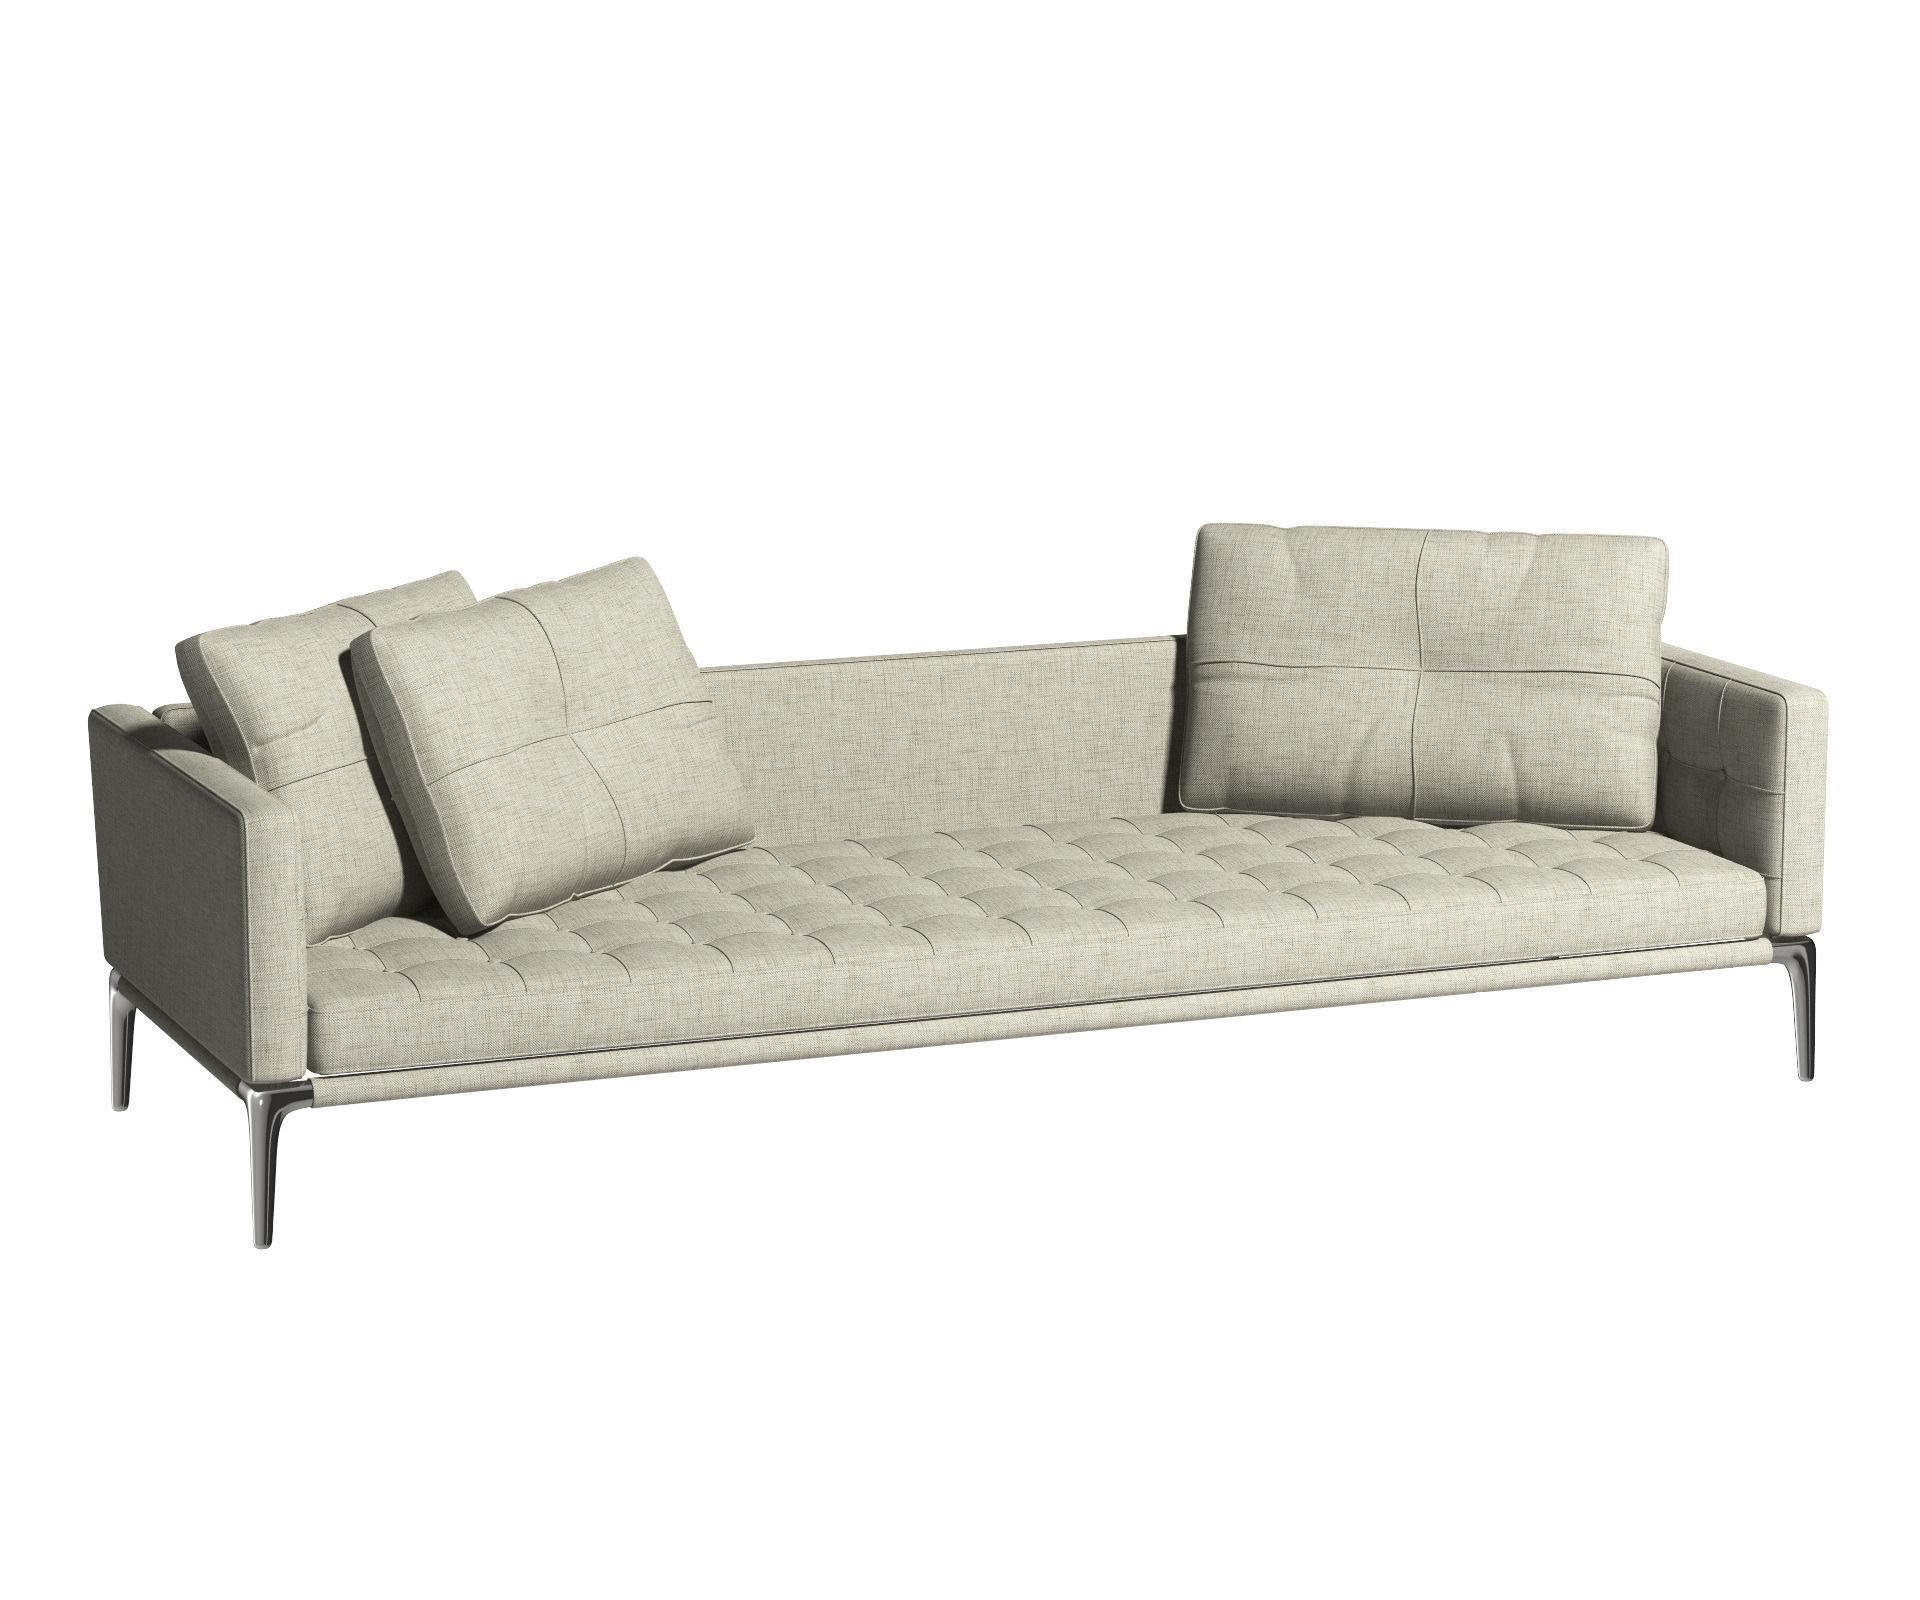 243 Volage Three Seater Sofa